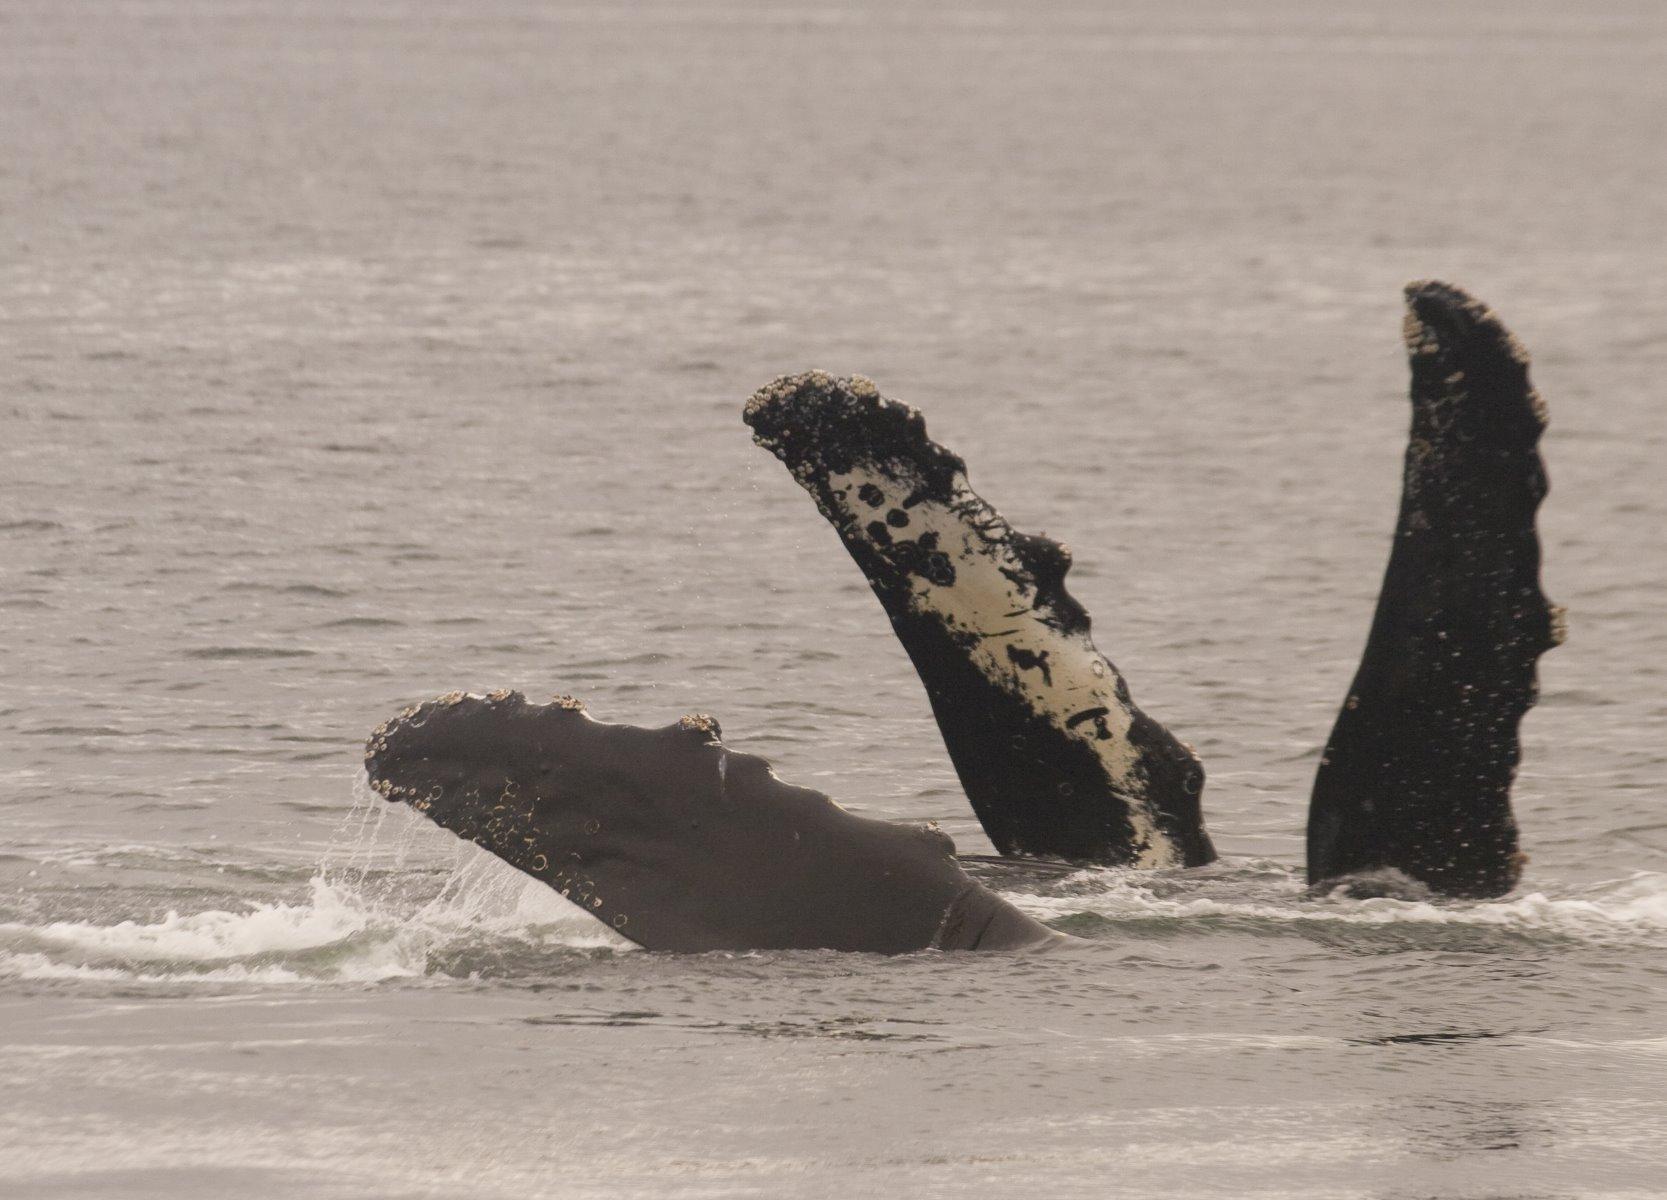 Humpback whale is formally the Megaptera novaeangliae